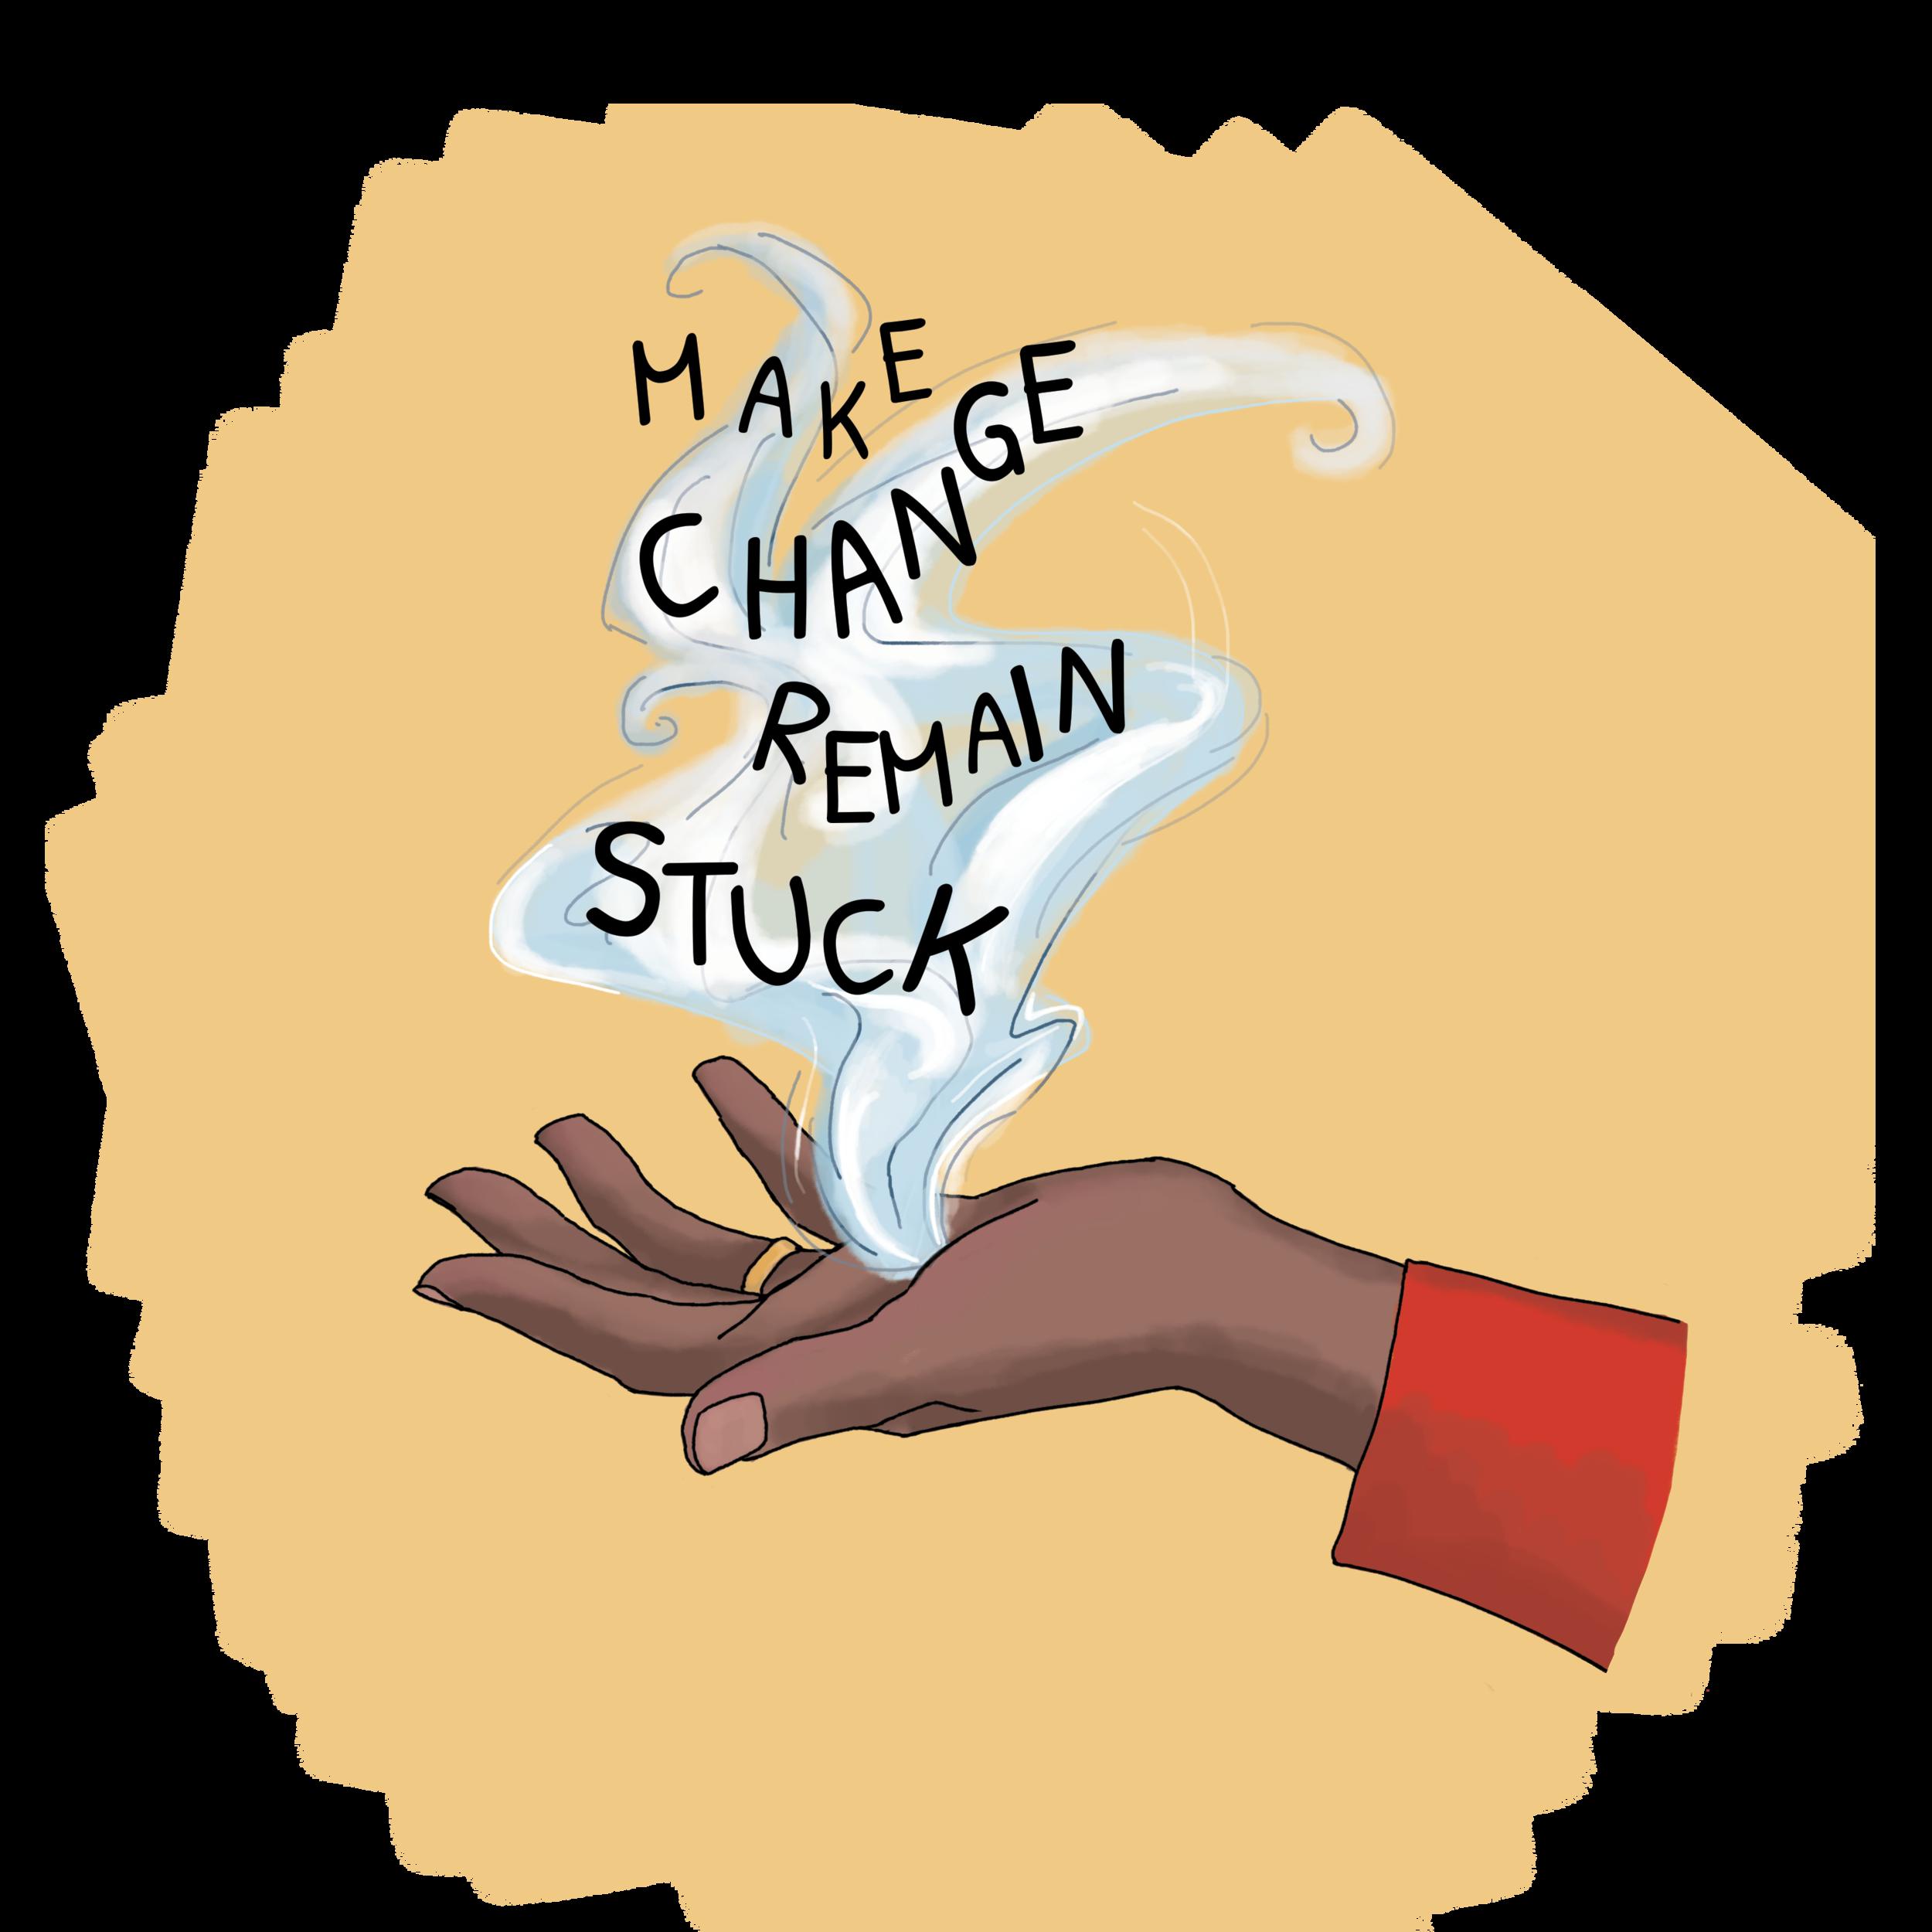 Make Change Remain Stuck